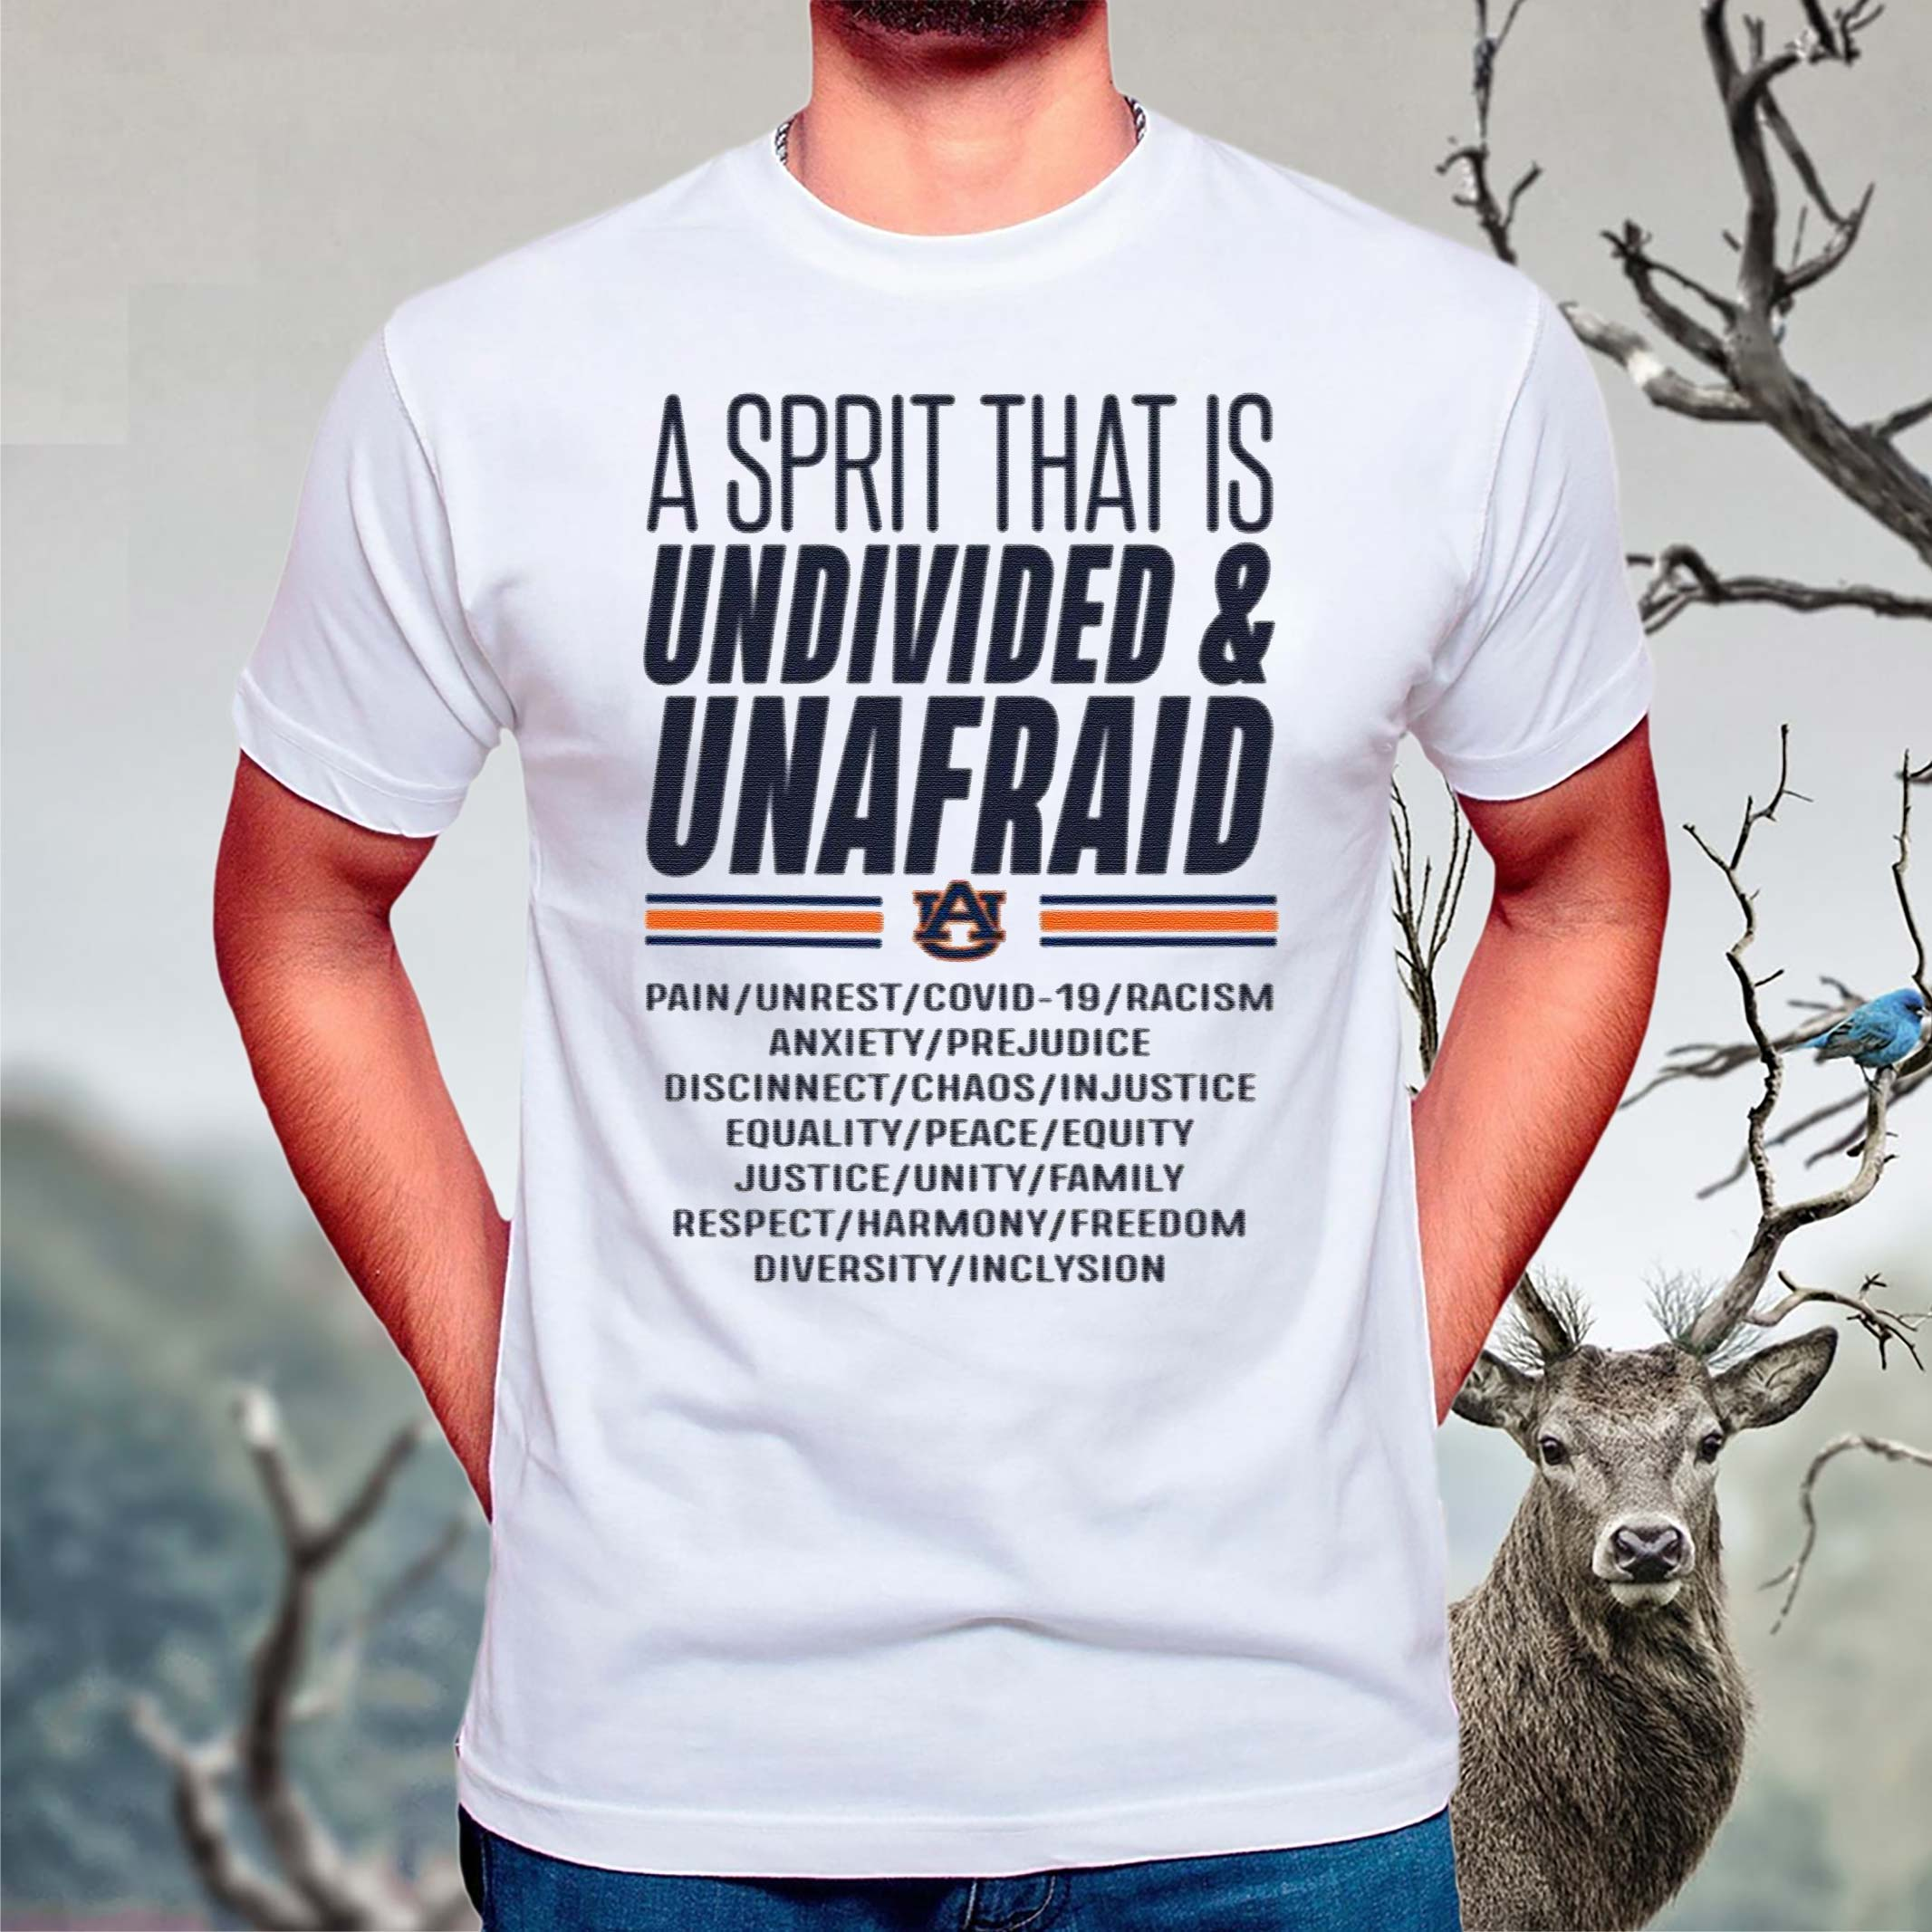 Undivided-&-Unafraid-SAAC-T-Shirt